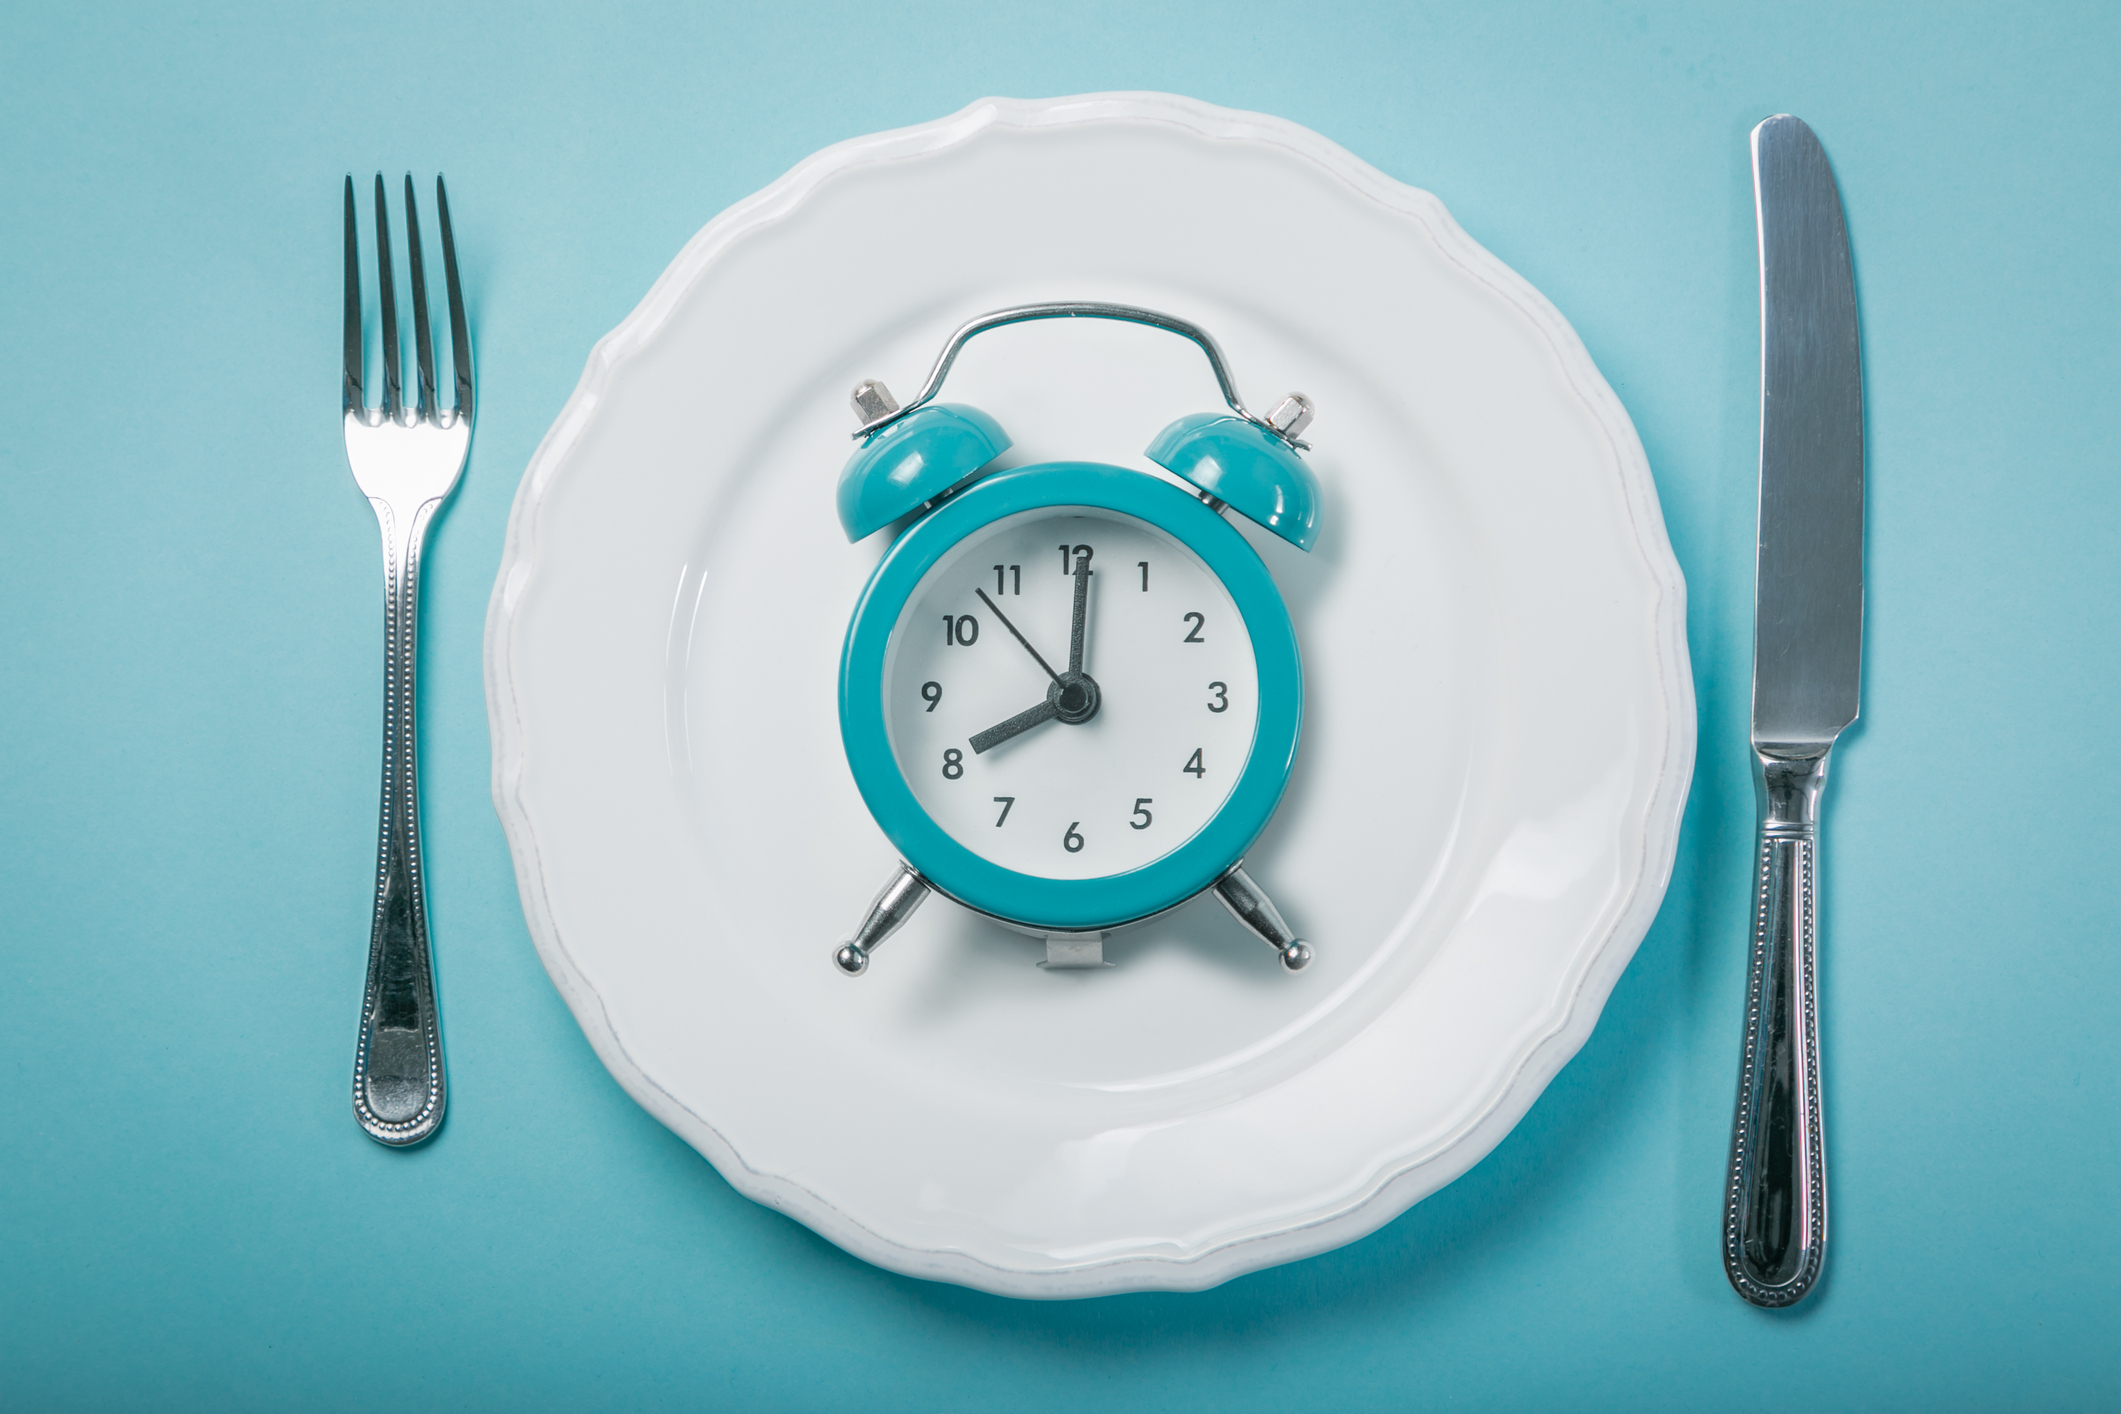 Intermittent fasting reduces